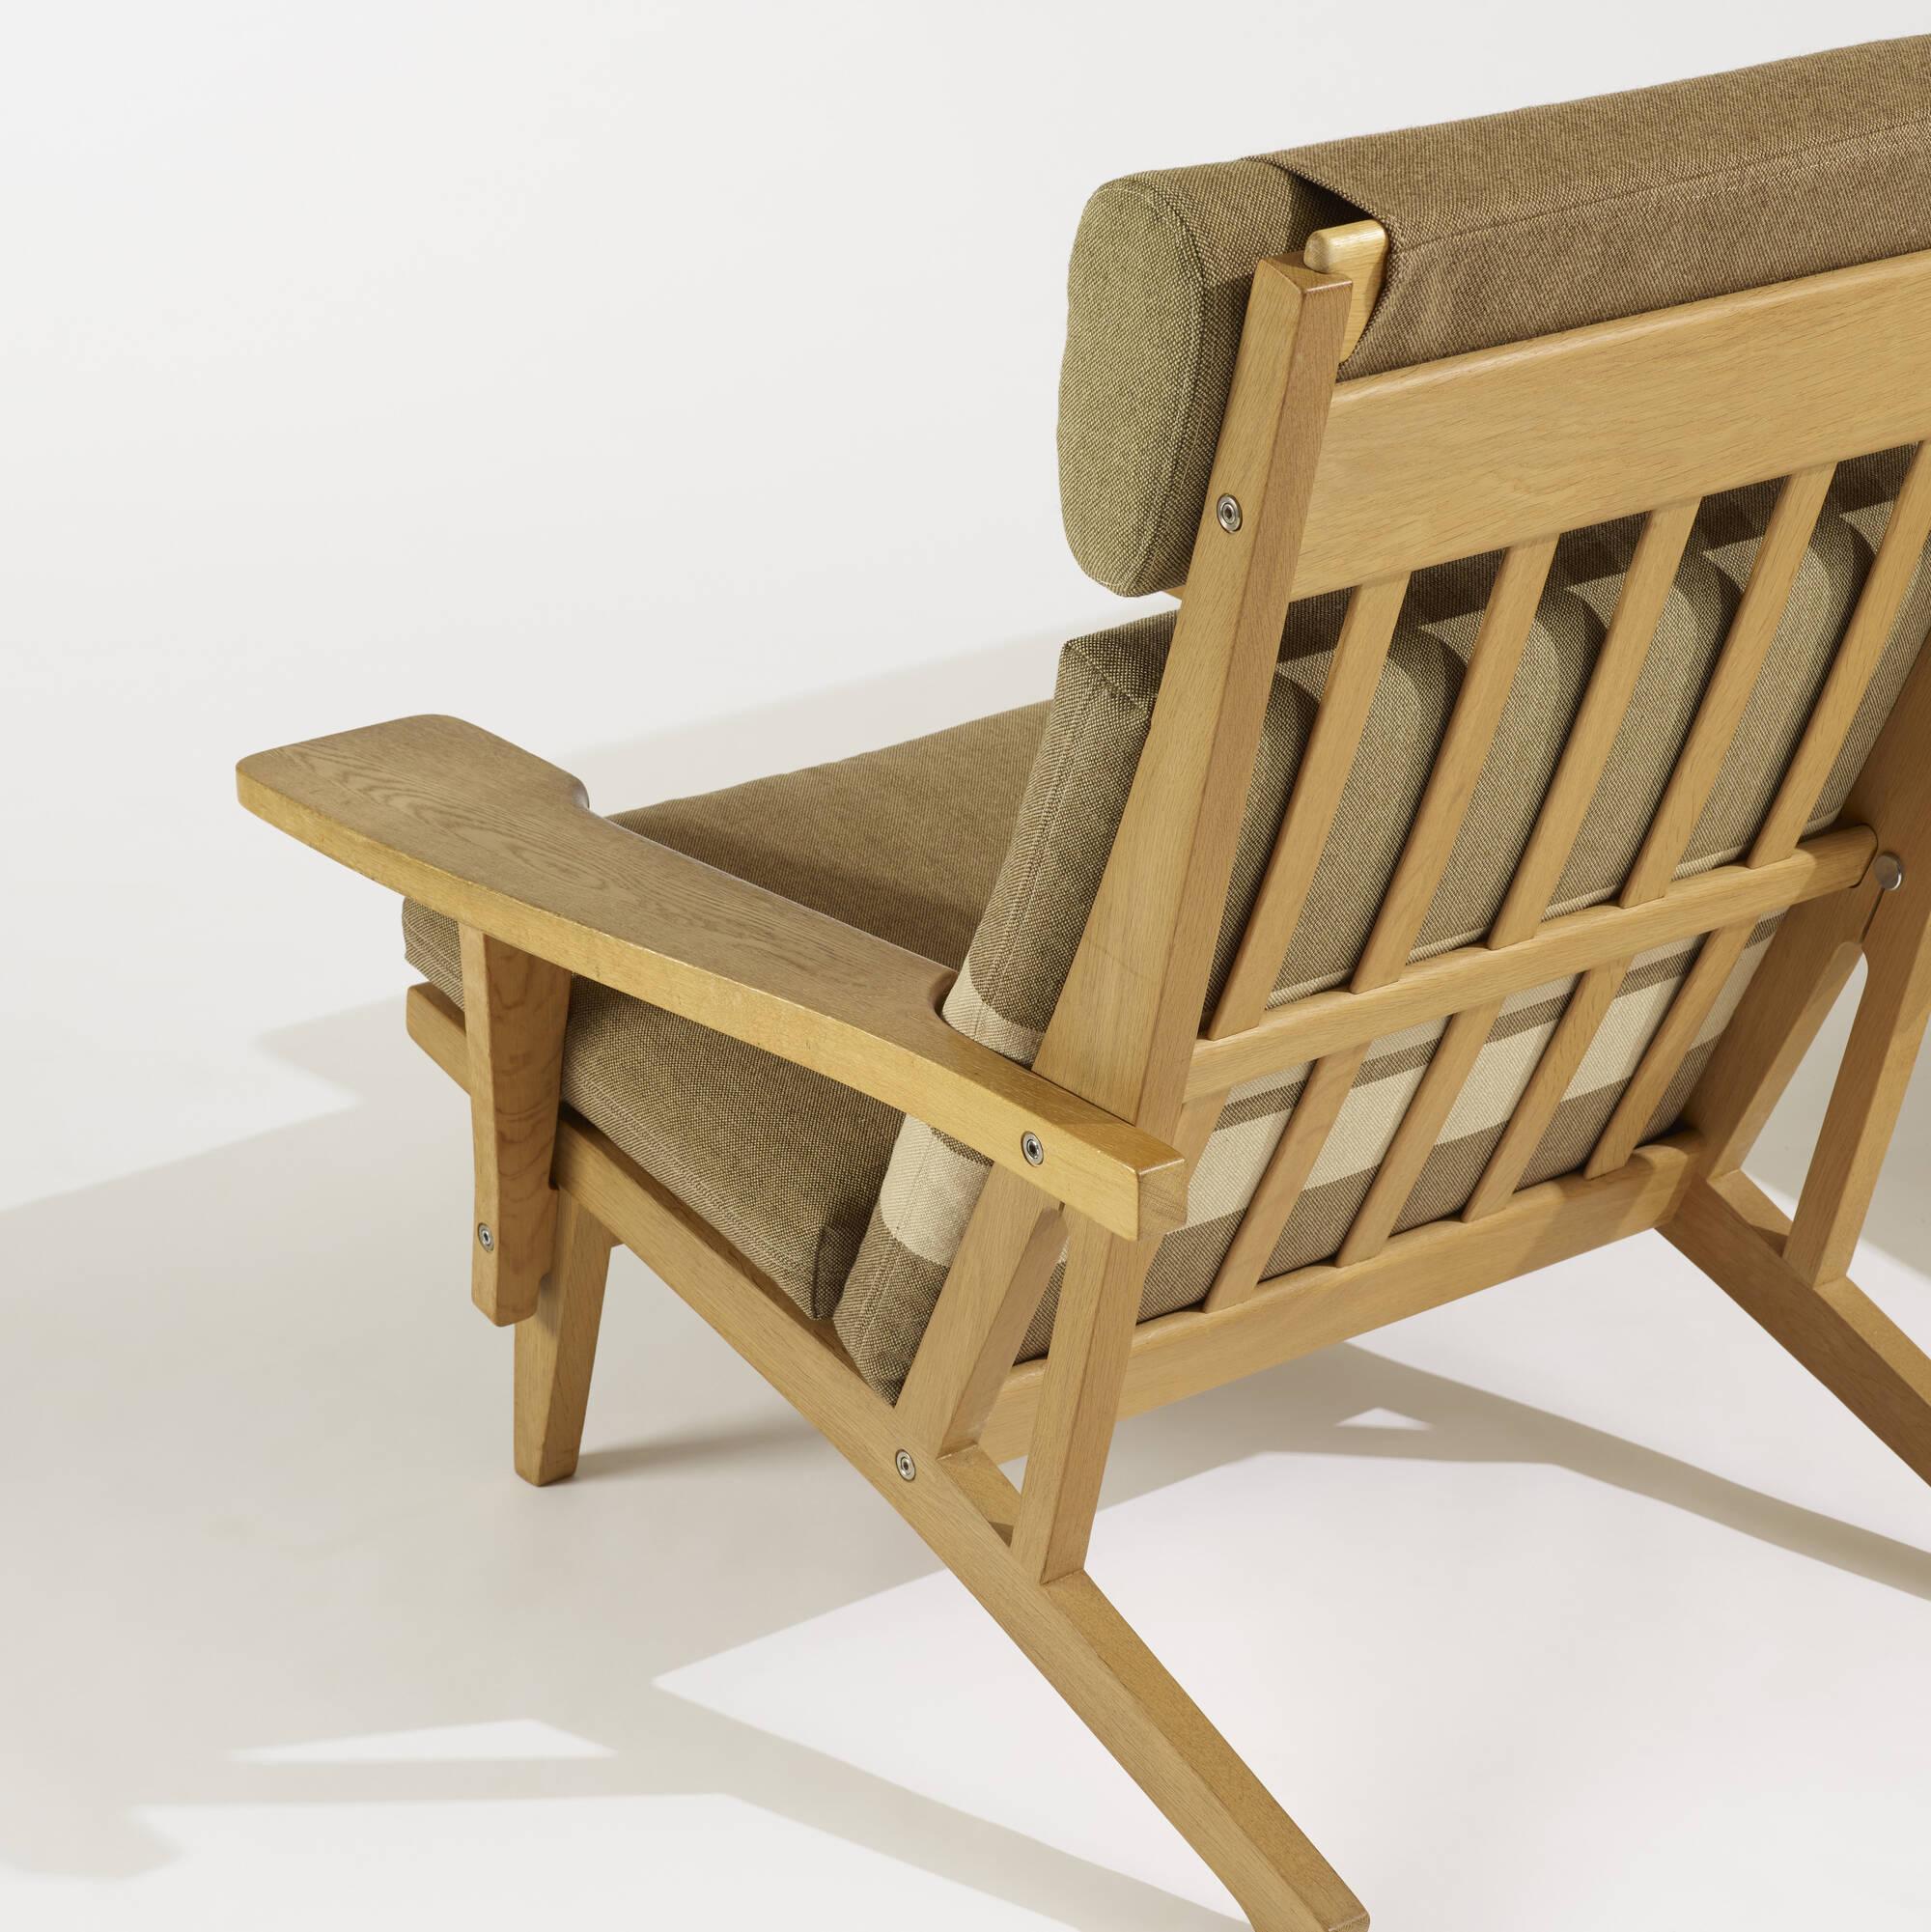 288: Hans J. Wegner / lounge chairs model GE375, pair (4 of 4)